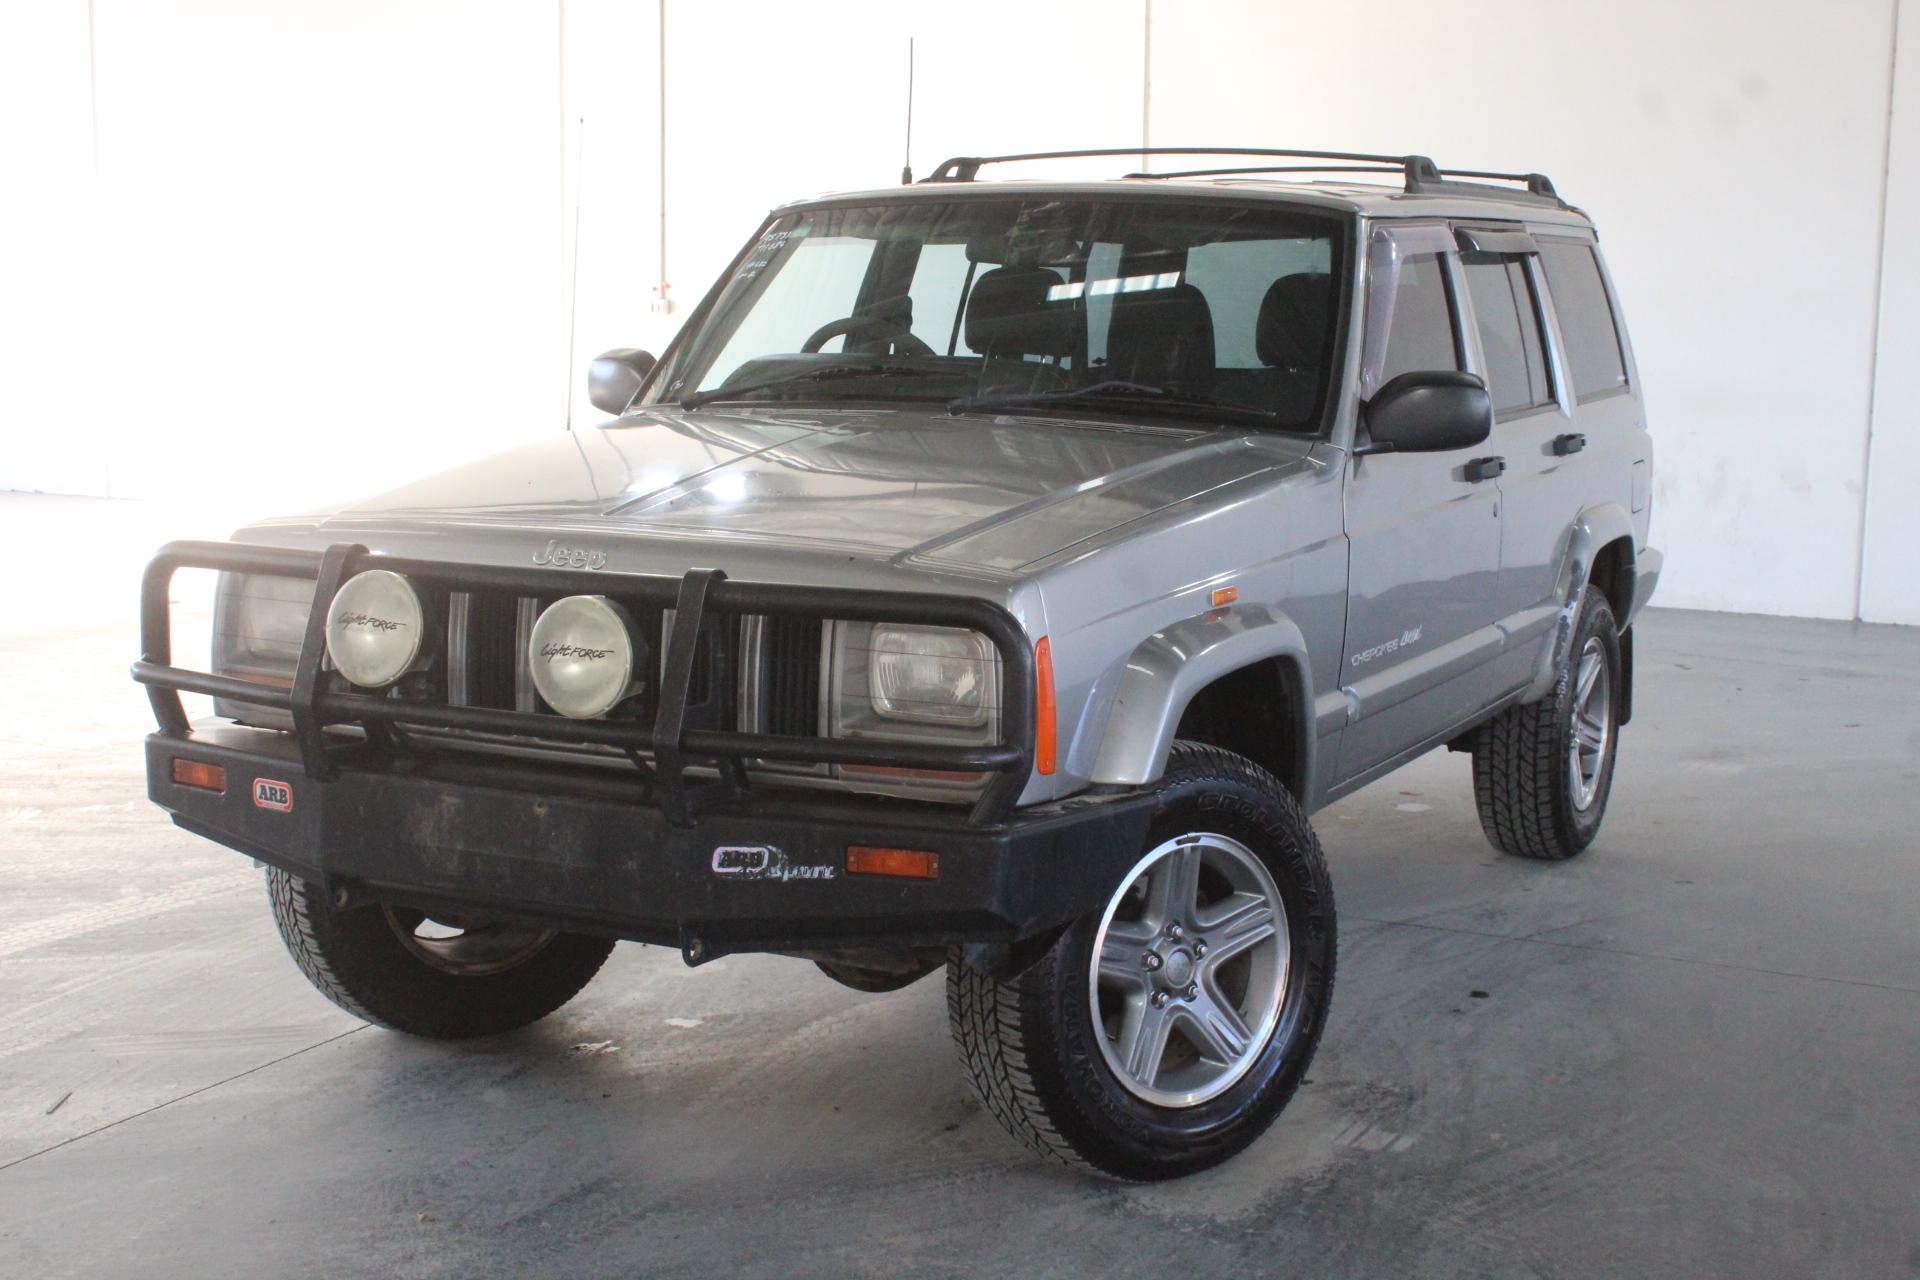 2001 Jeep Cherokee Classic (4x4) XJ Automatic Wagon